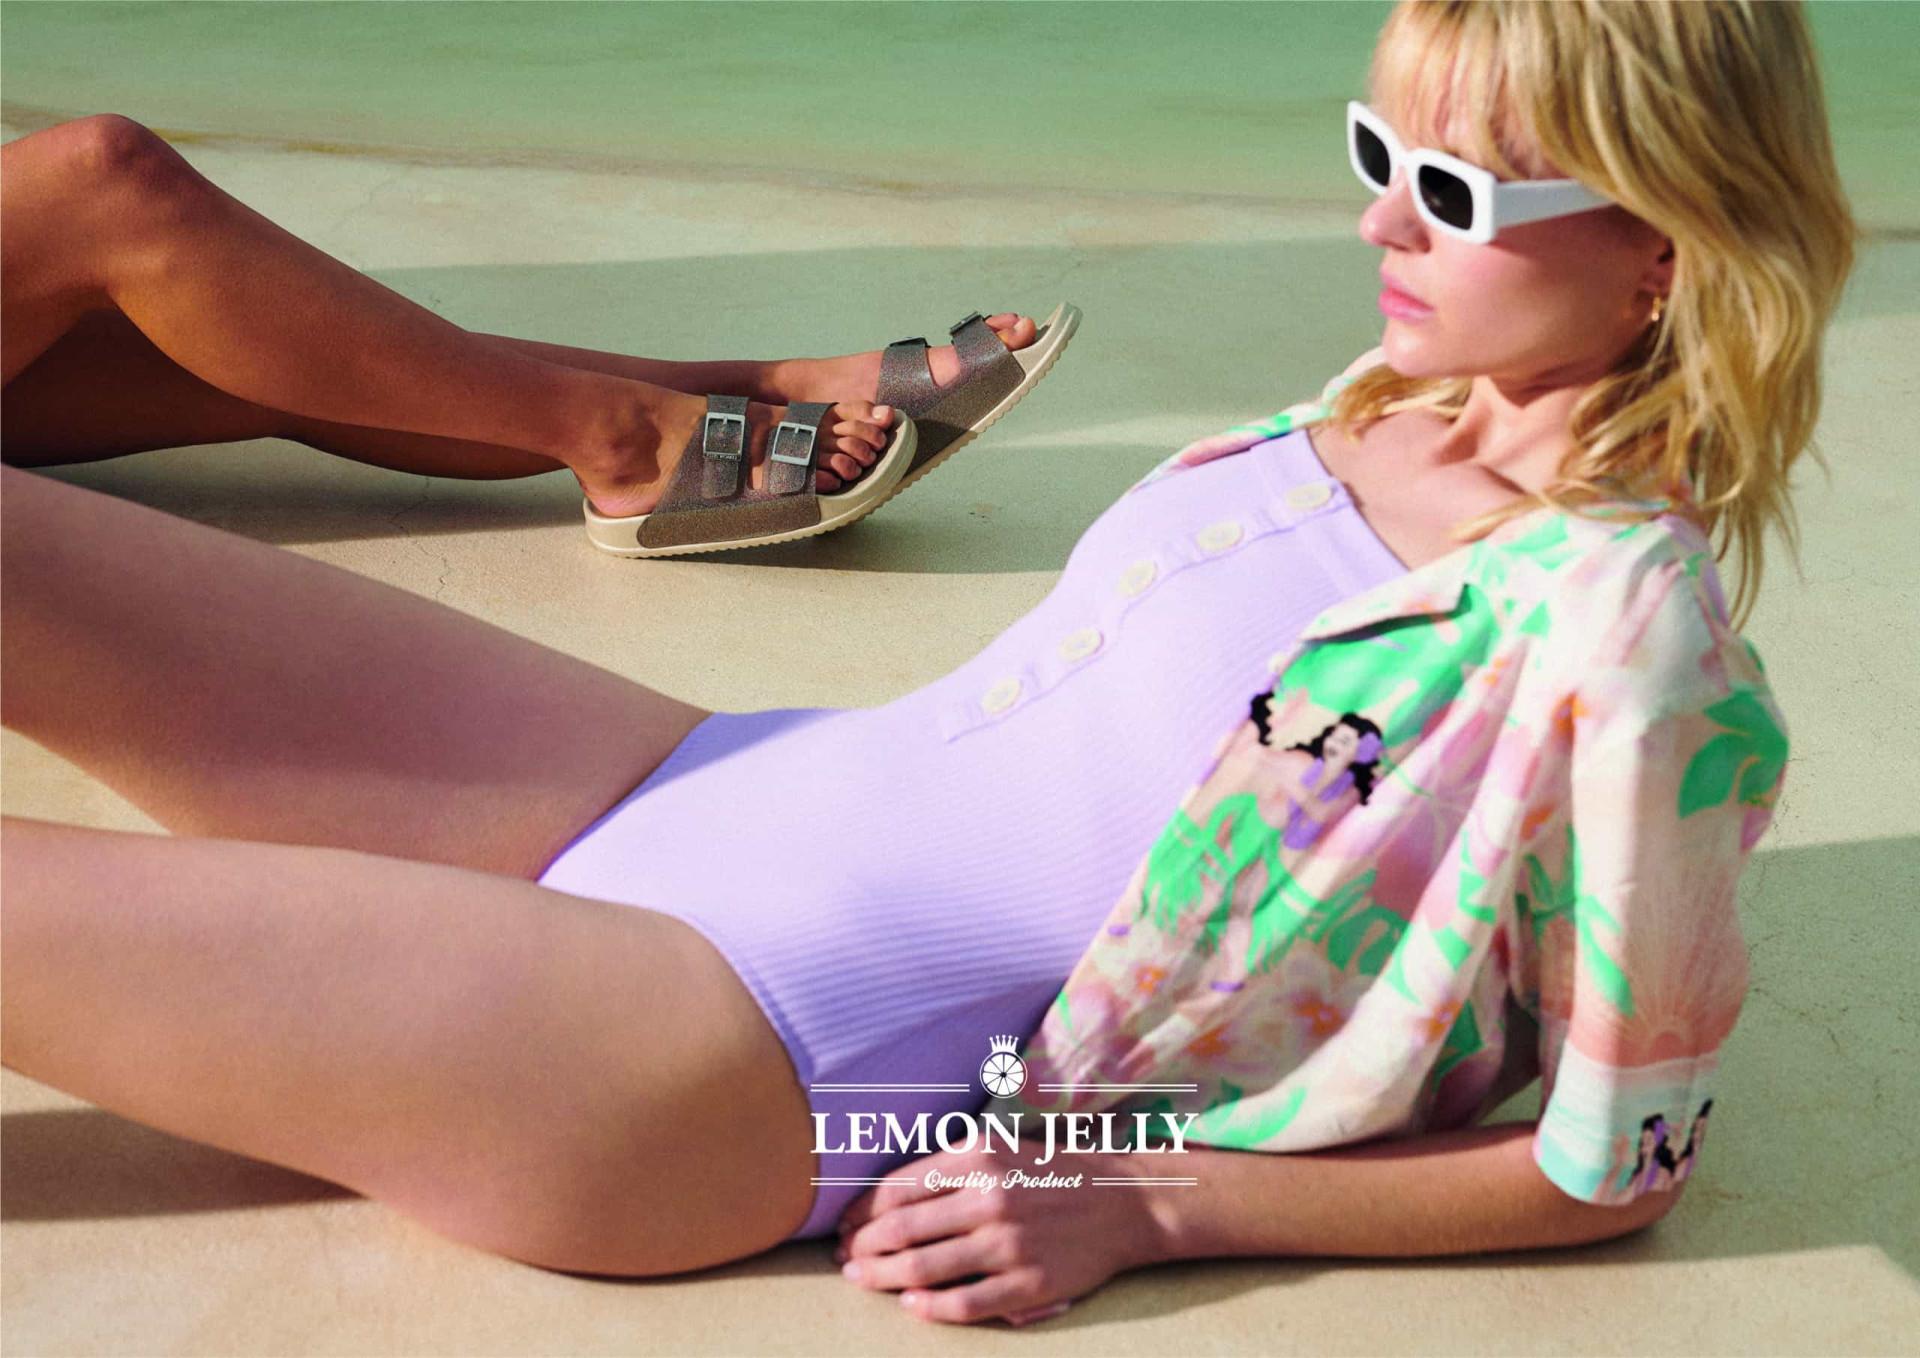 Lemon Jelly apresenta 'Sensori Tale' para a primavera/verão '20